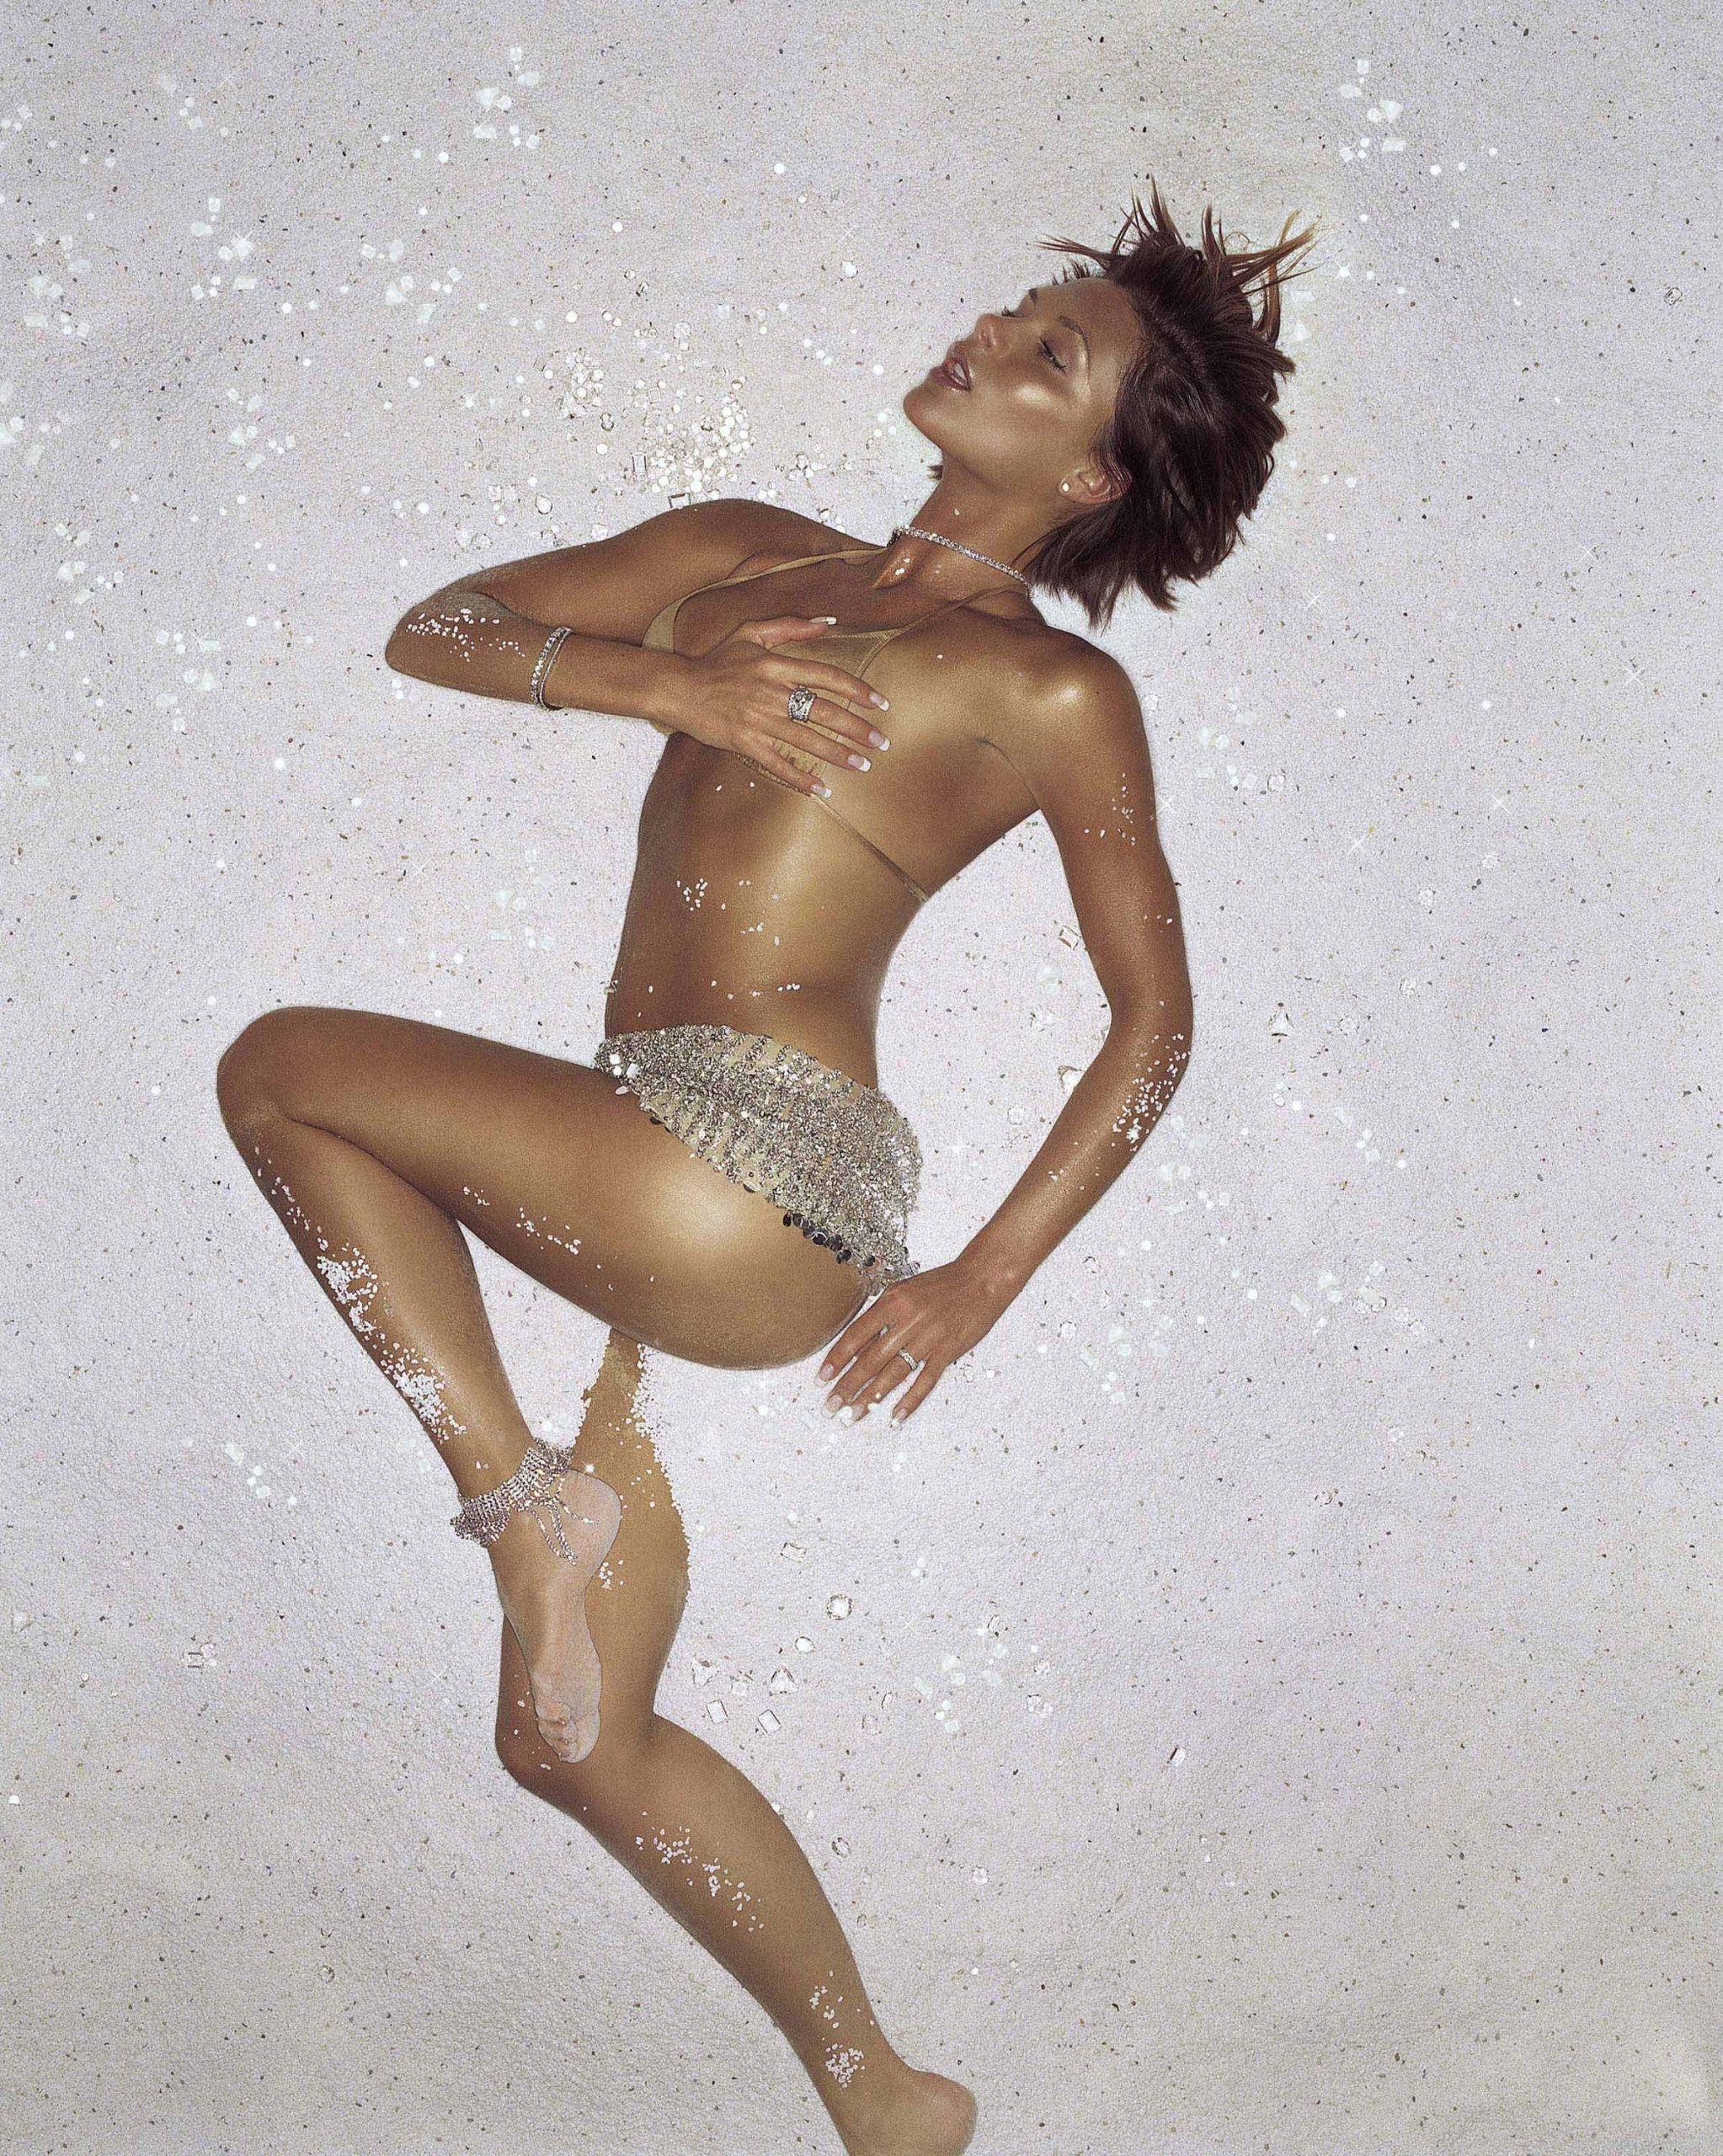 Victoria Beckham sexy feet pic